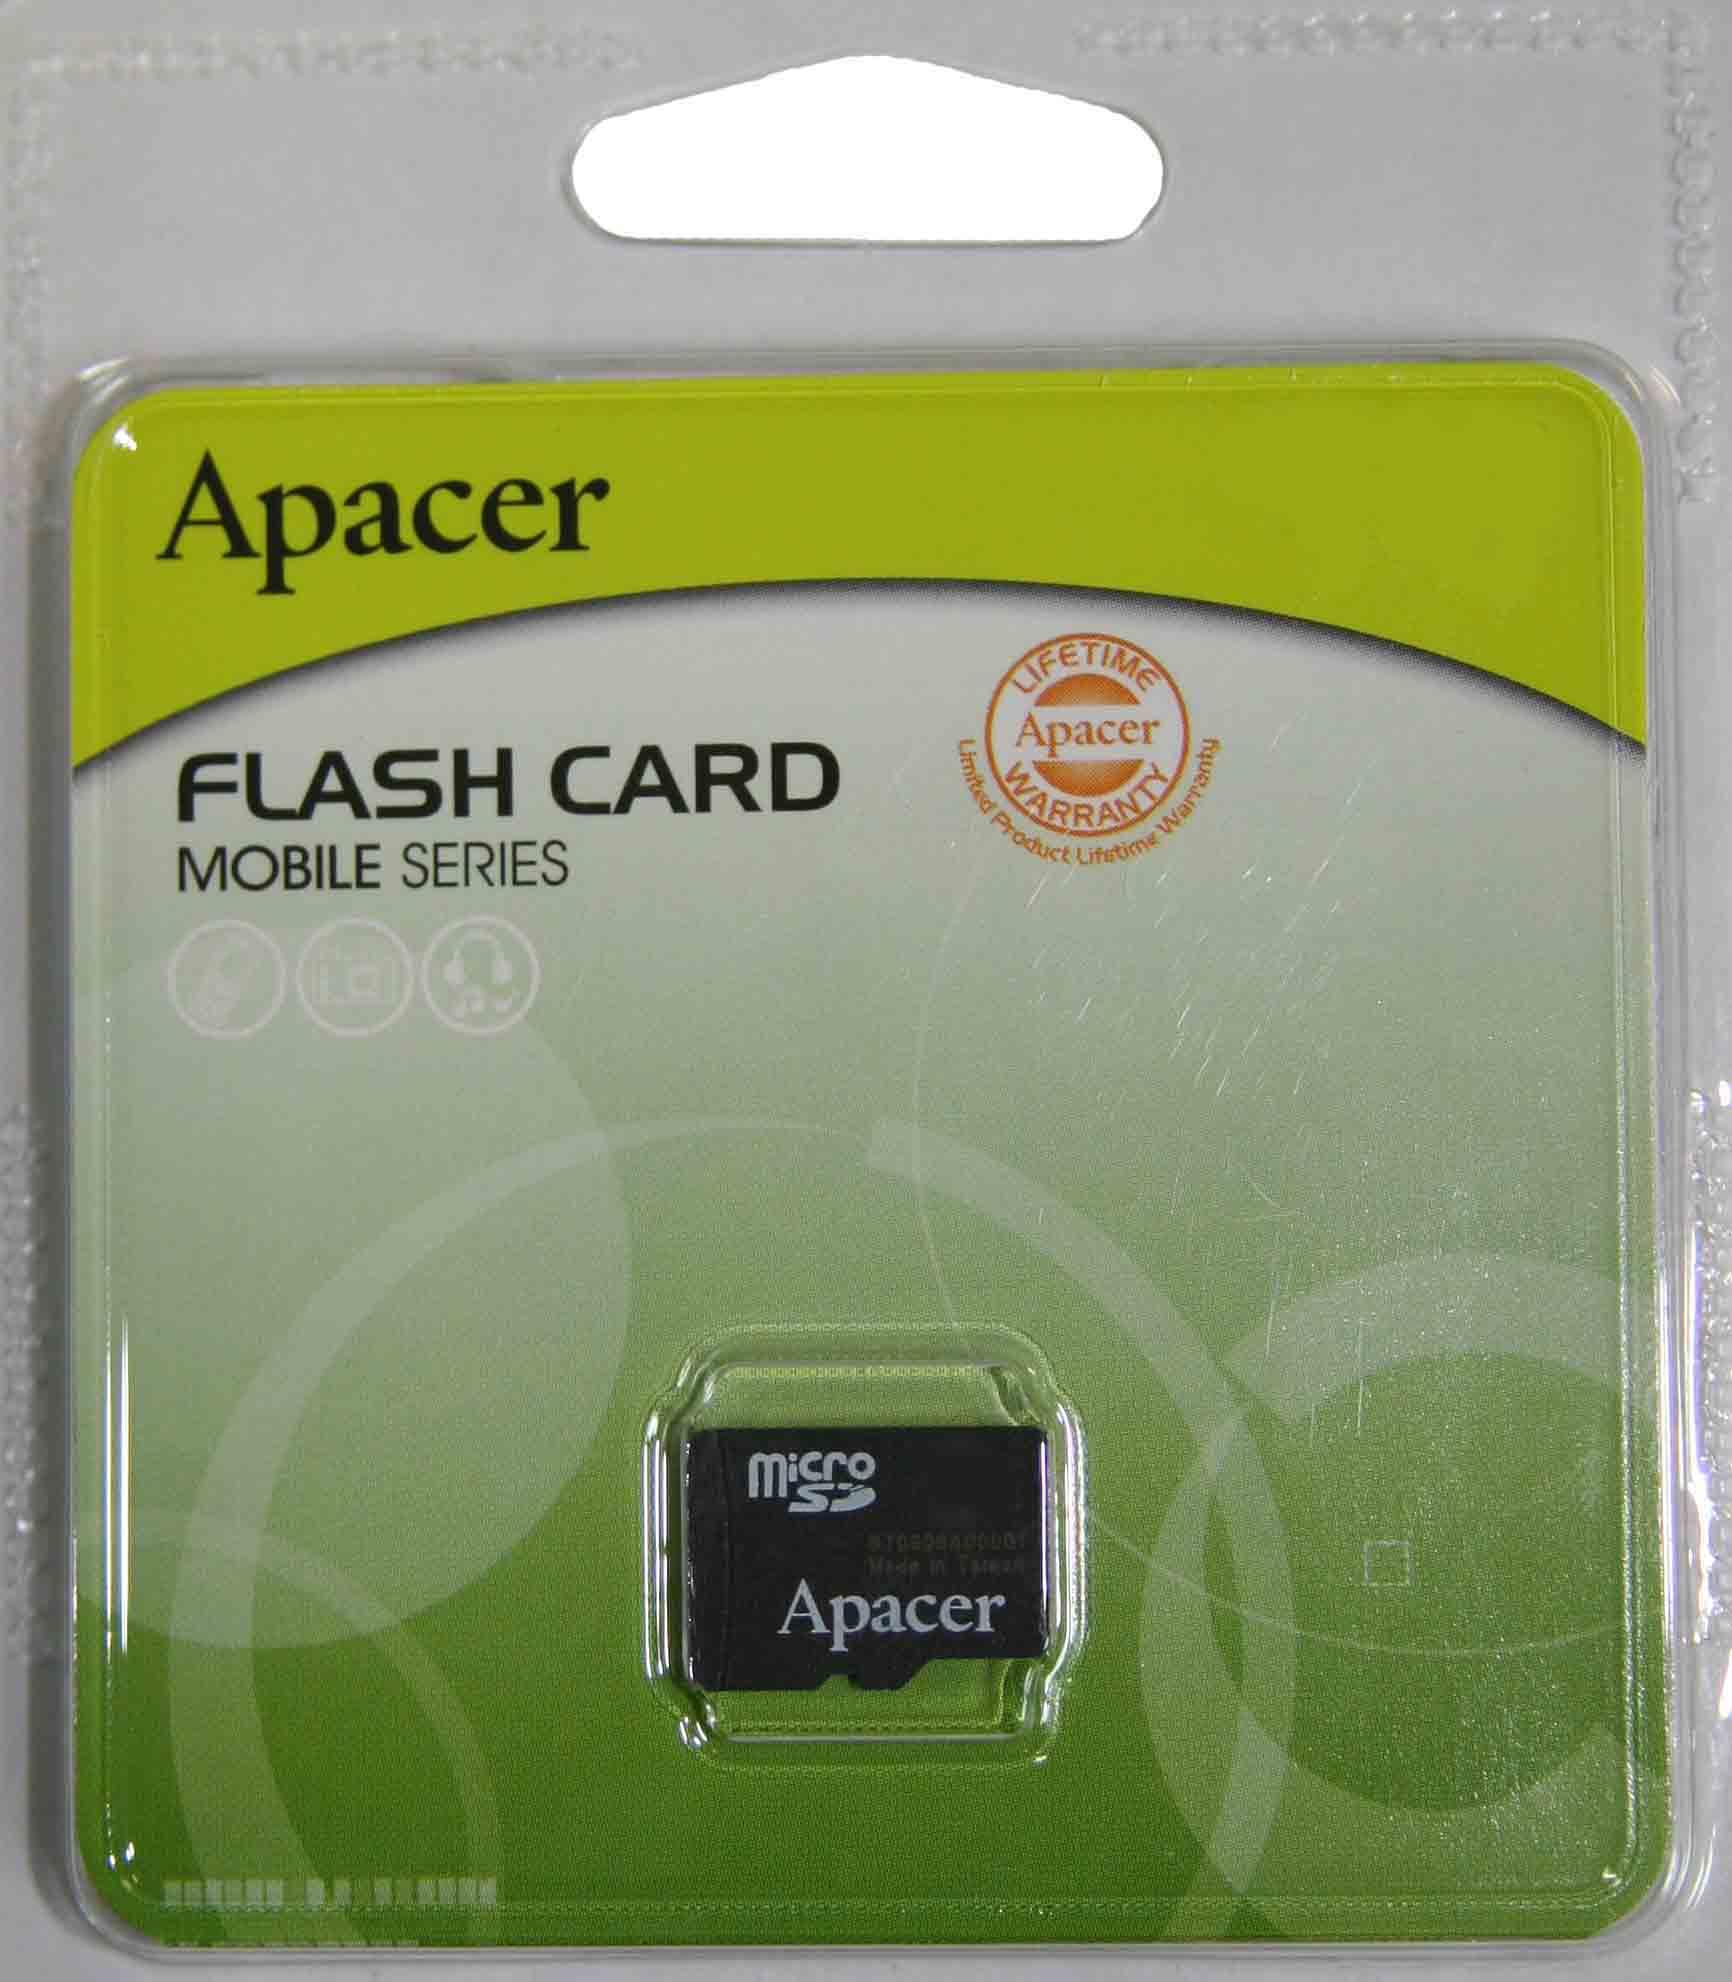 Sdhc 4gb how many photos Memory card capacity Best digital camera - DigicamHelp